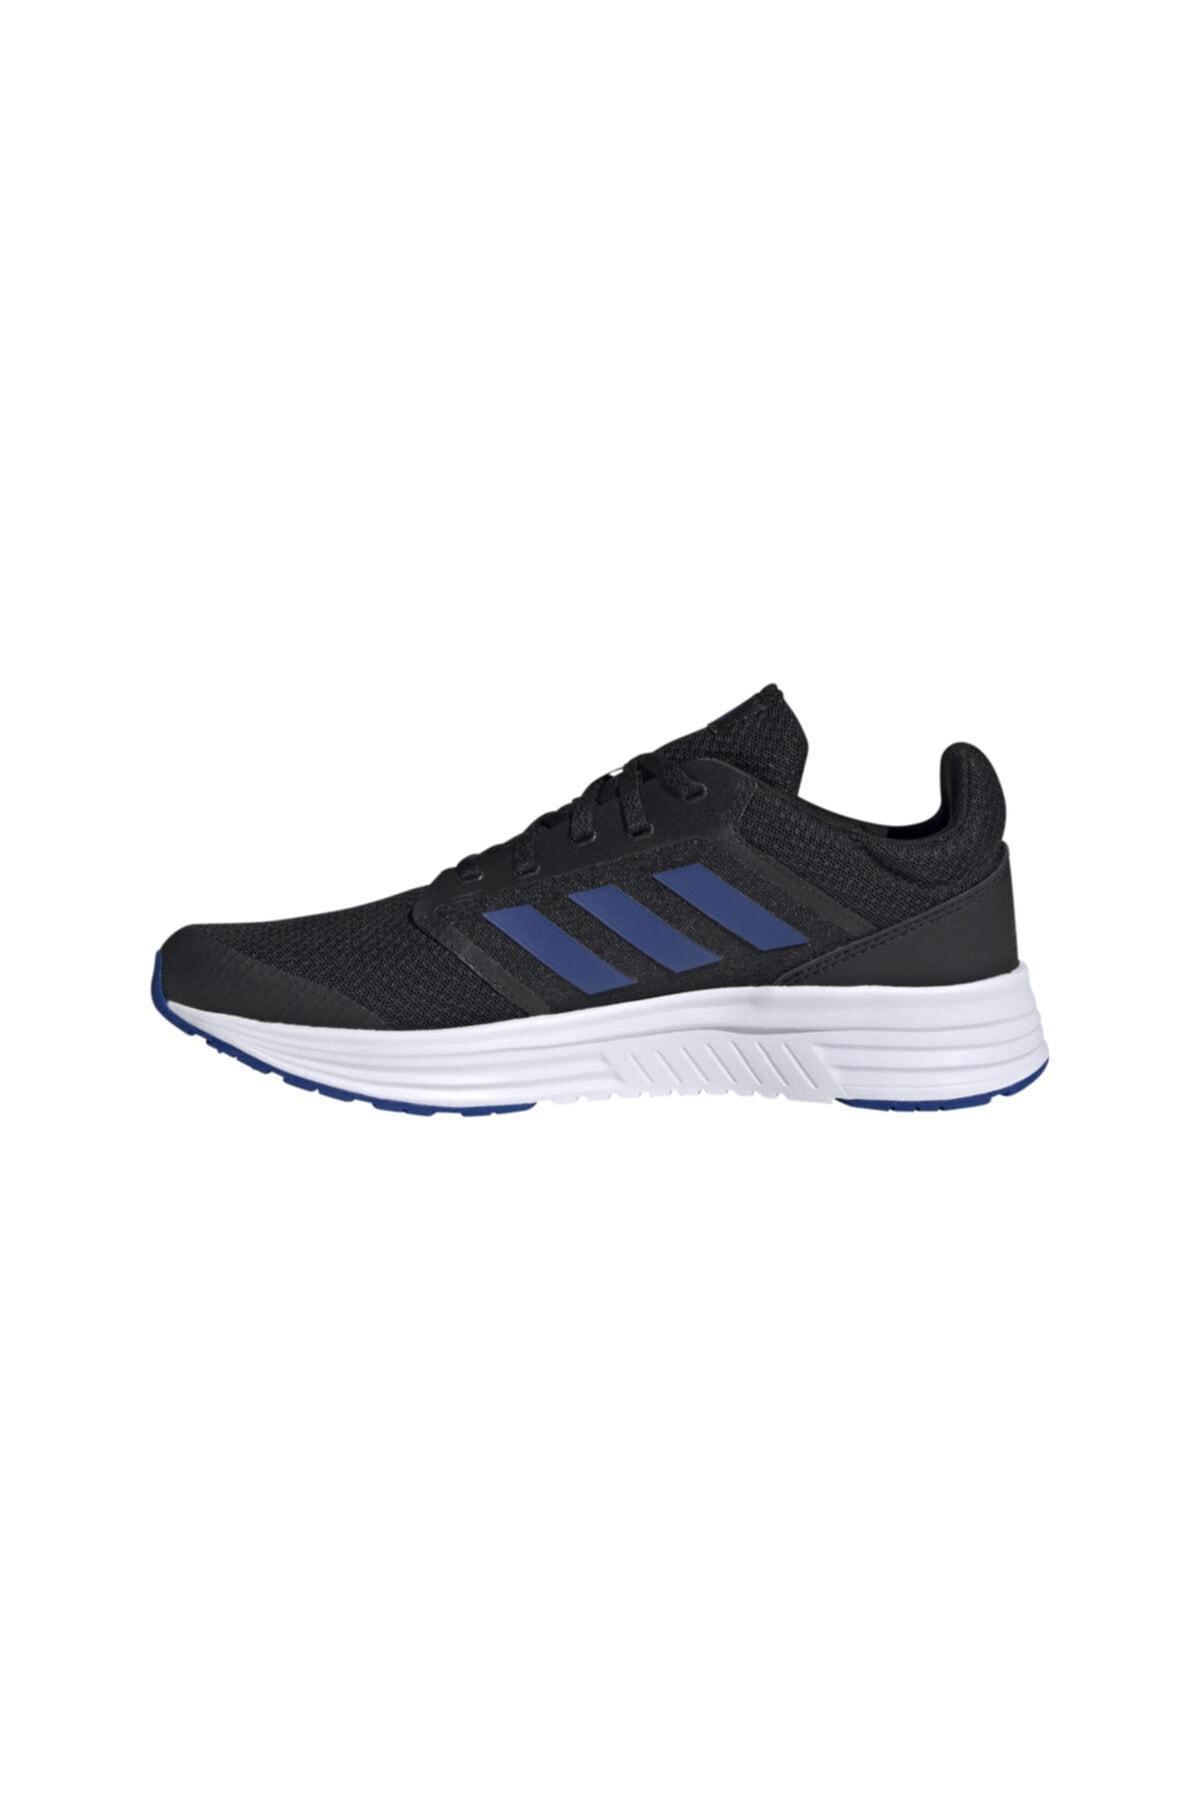 adidas GALAXY 5 Siyah Erkek Koşu Ayakkabısı 100663975 2